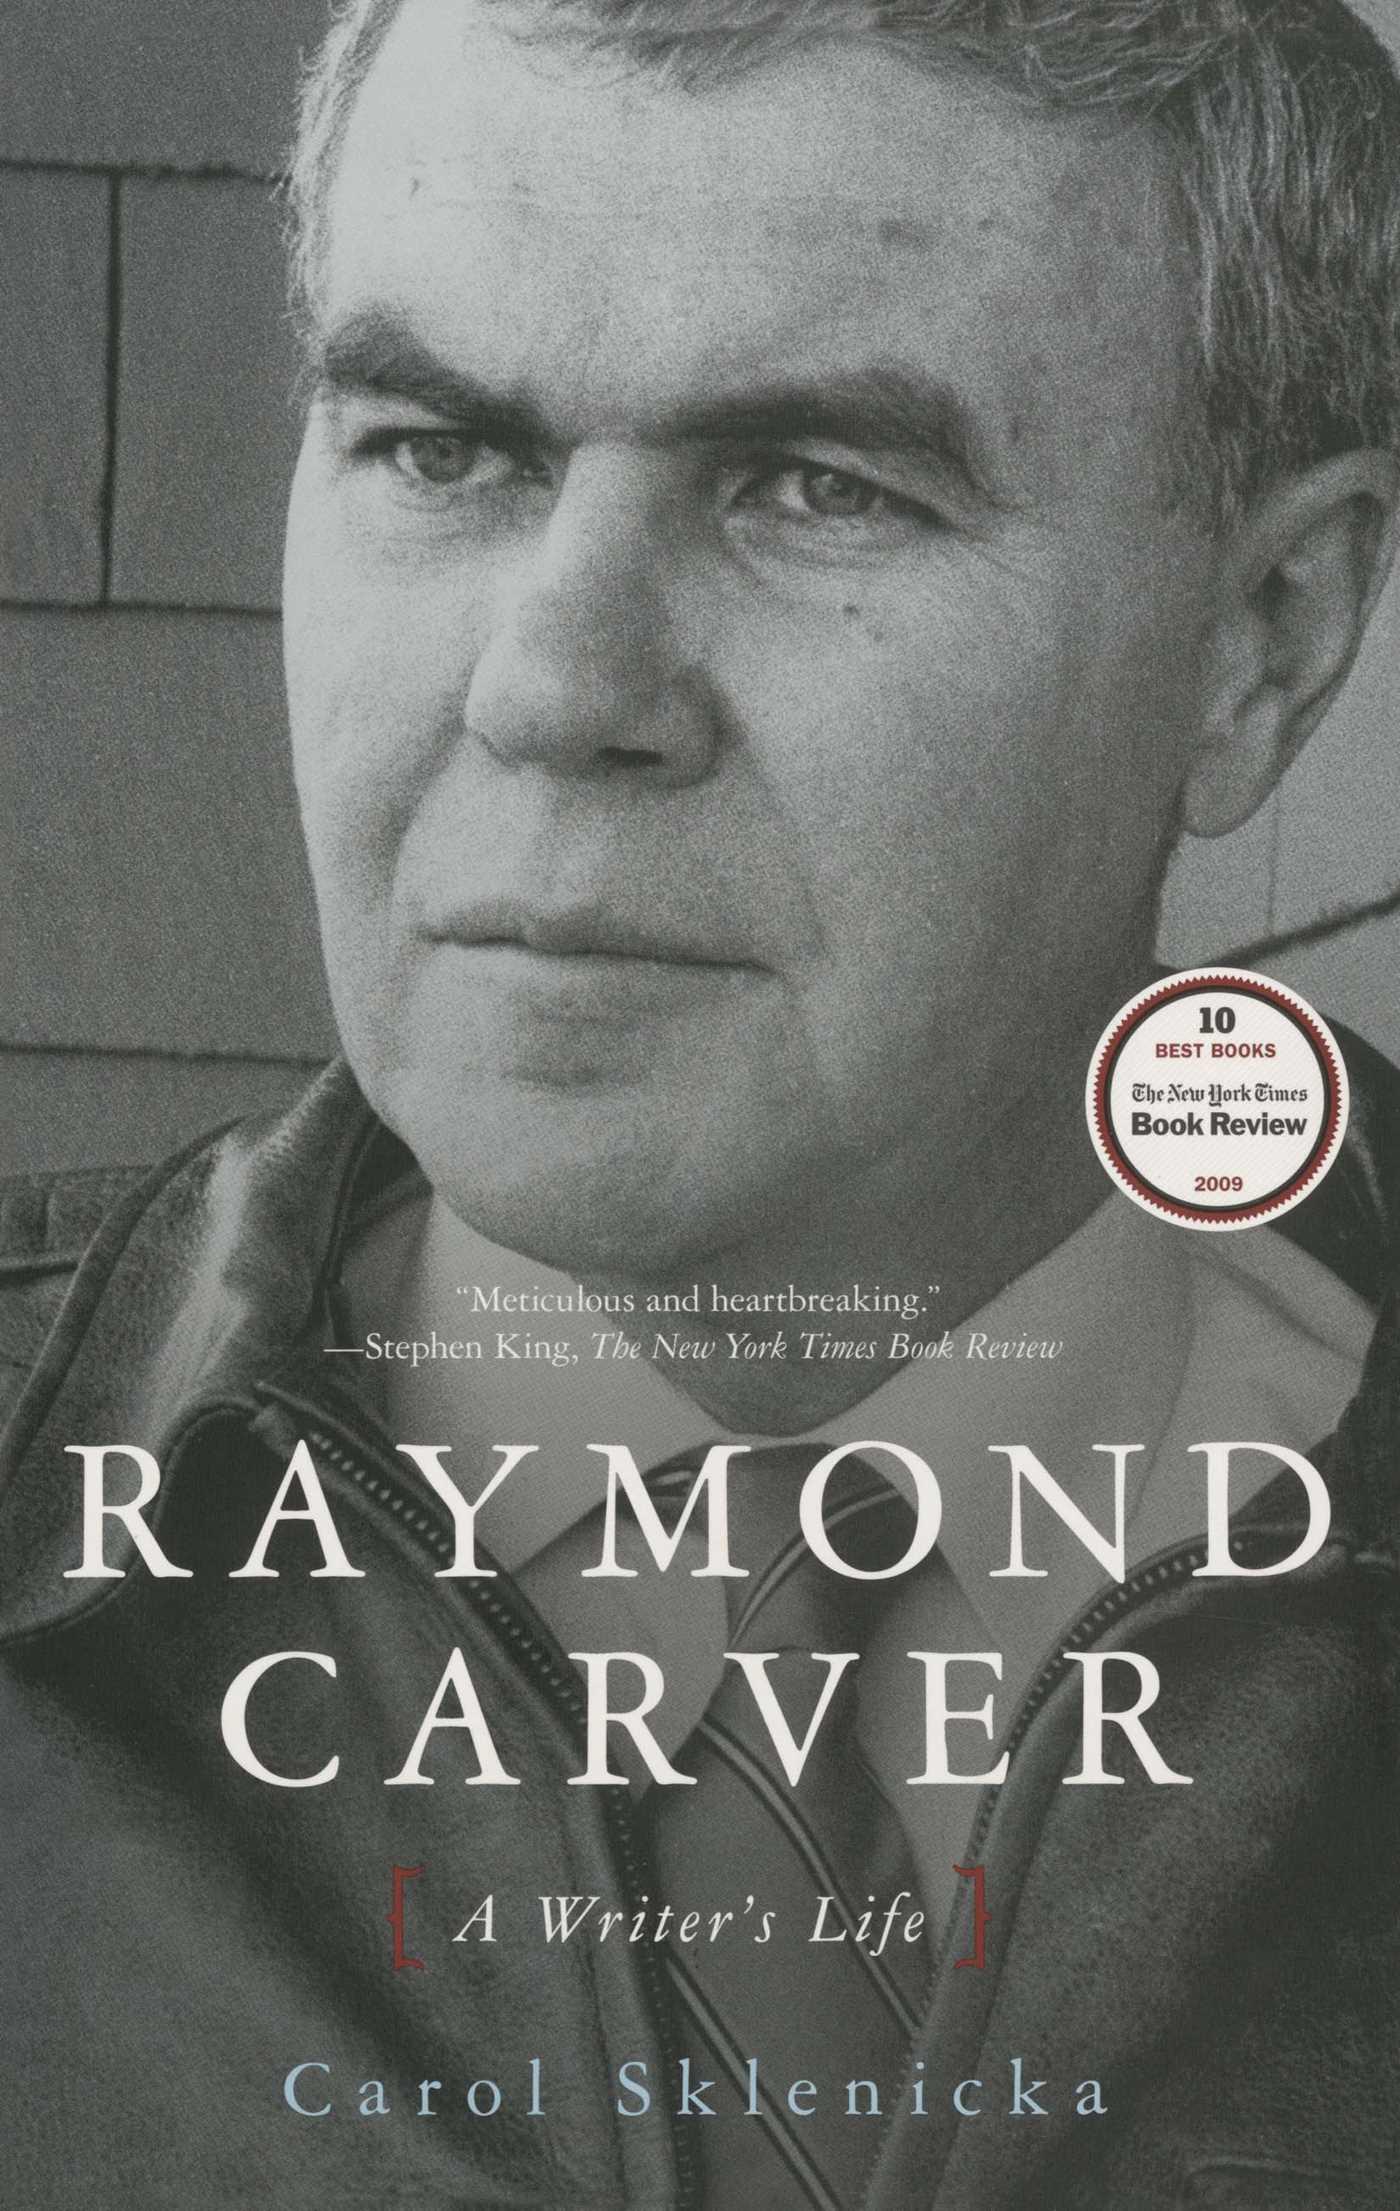 Raymond carver 9781439160589 hr